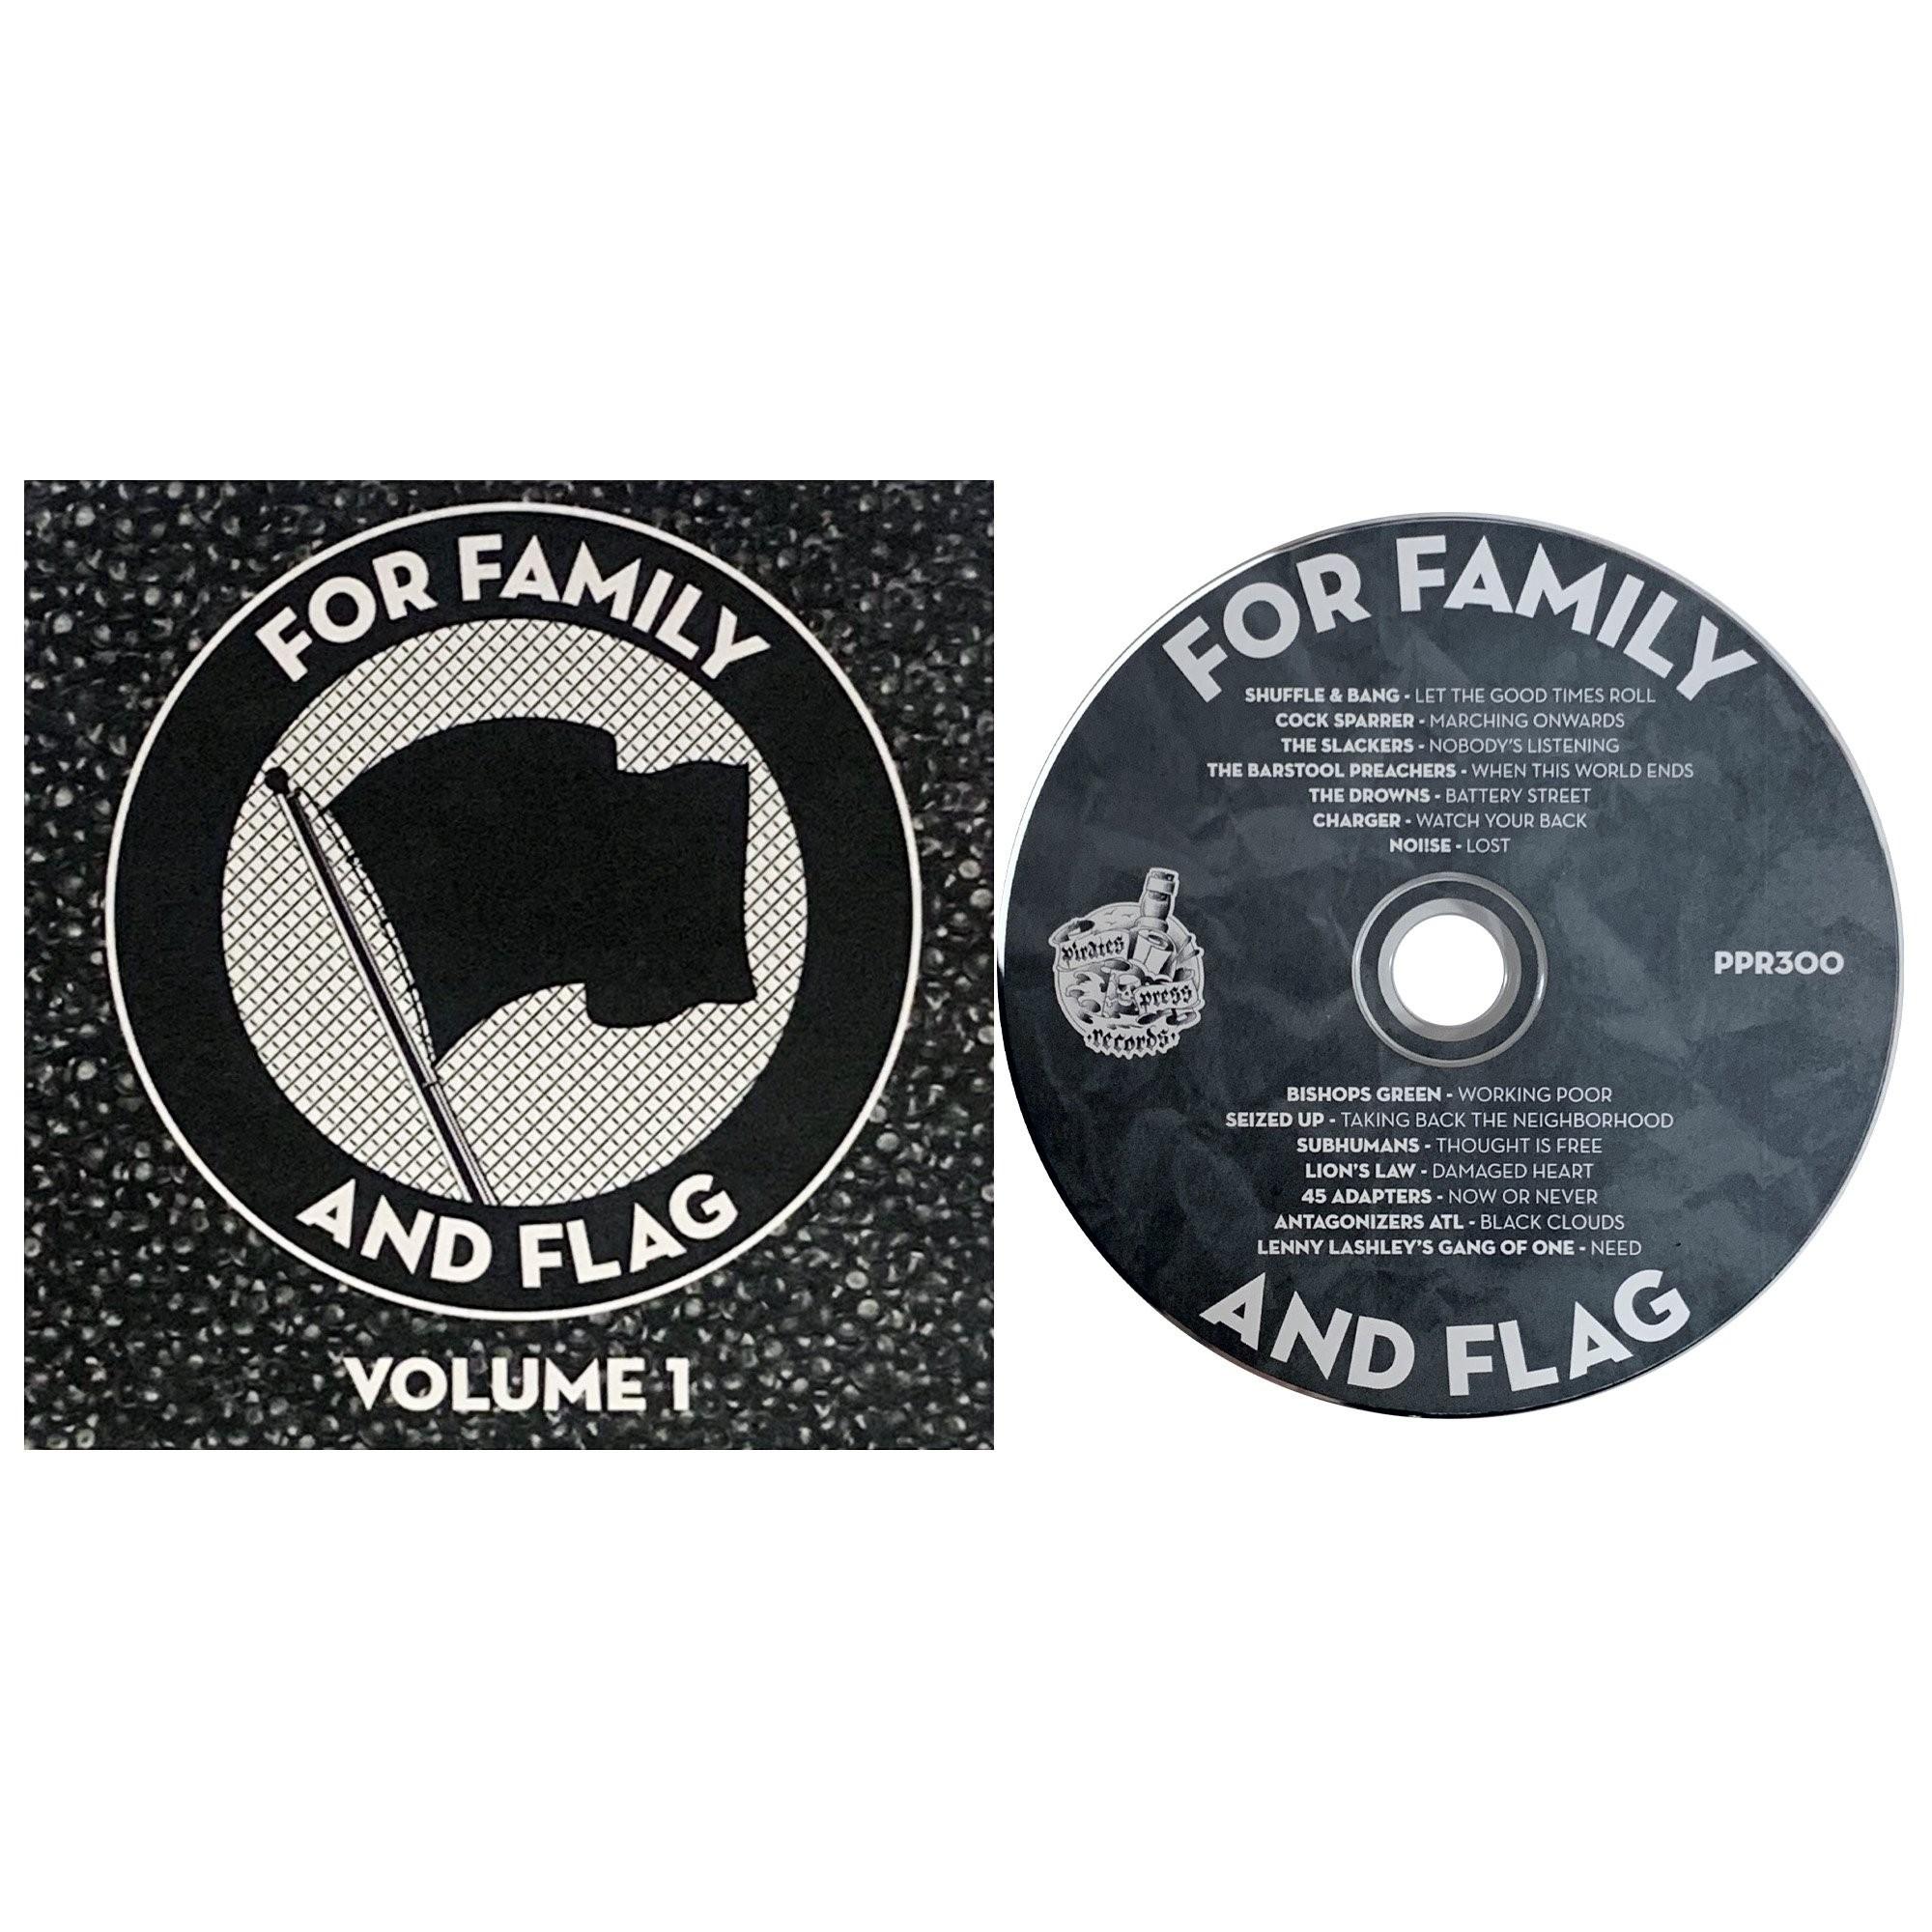 V/A FOR FAMILY AND FLAG VOL. 1 CD